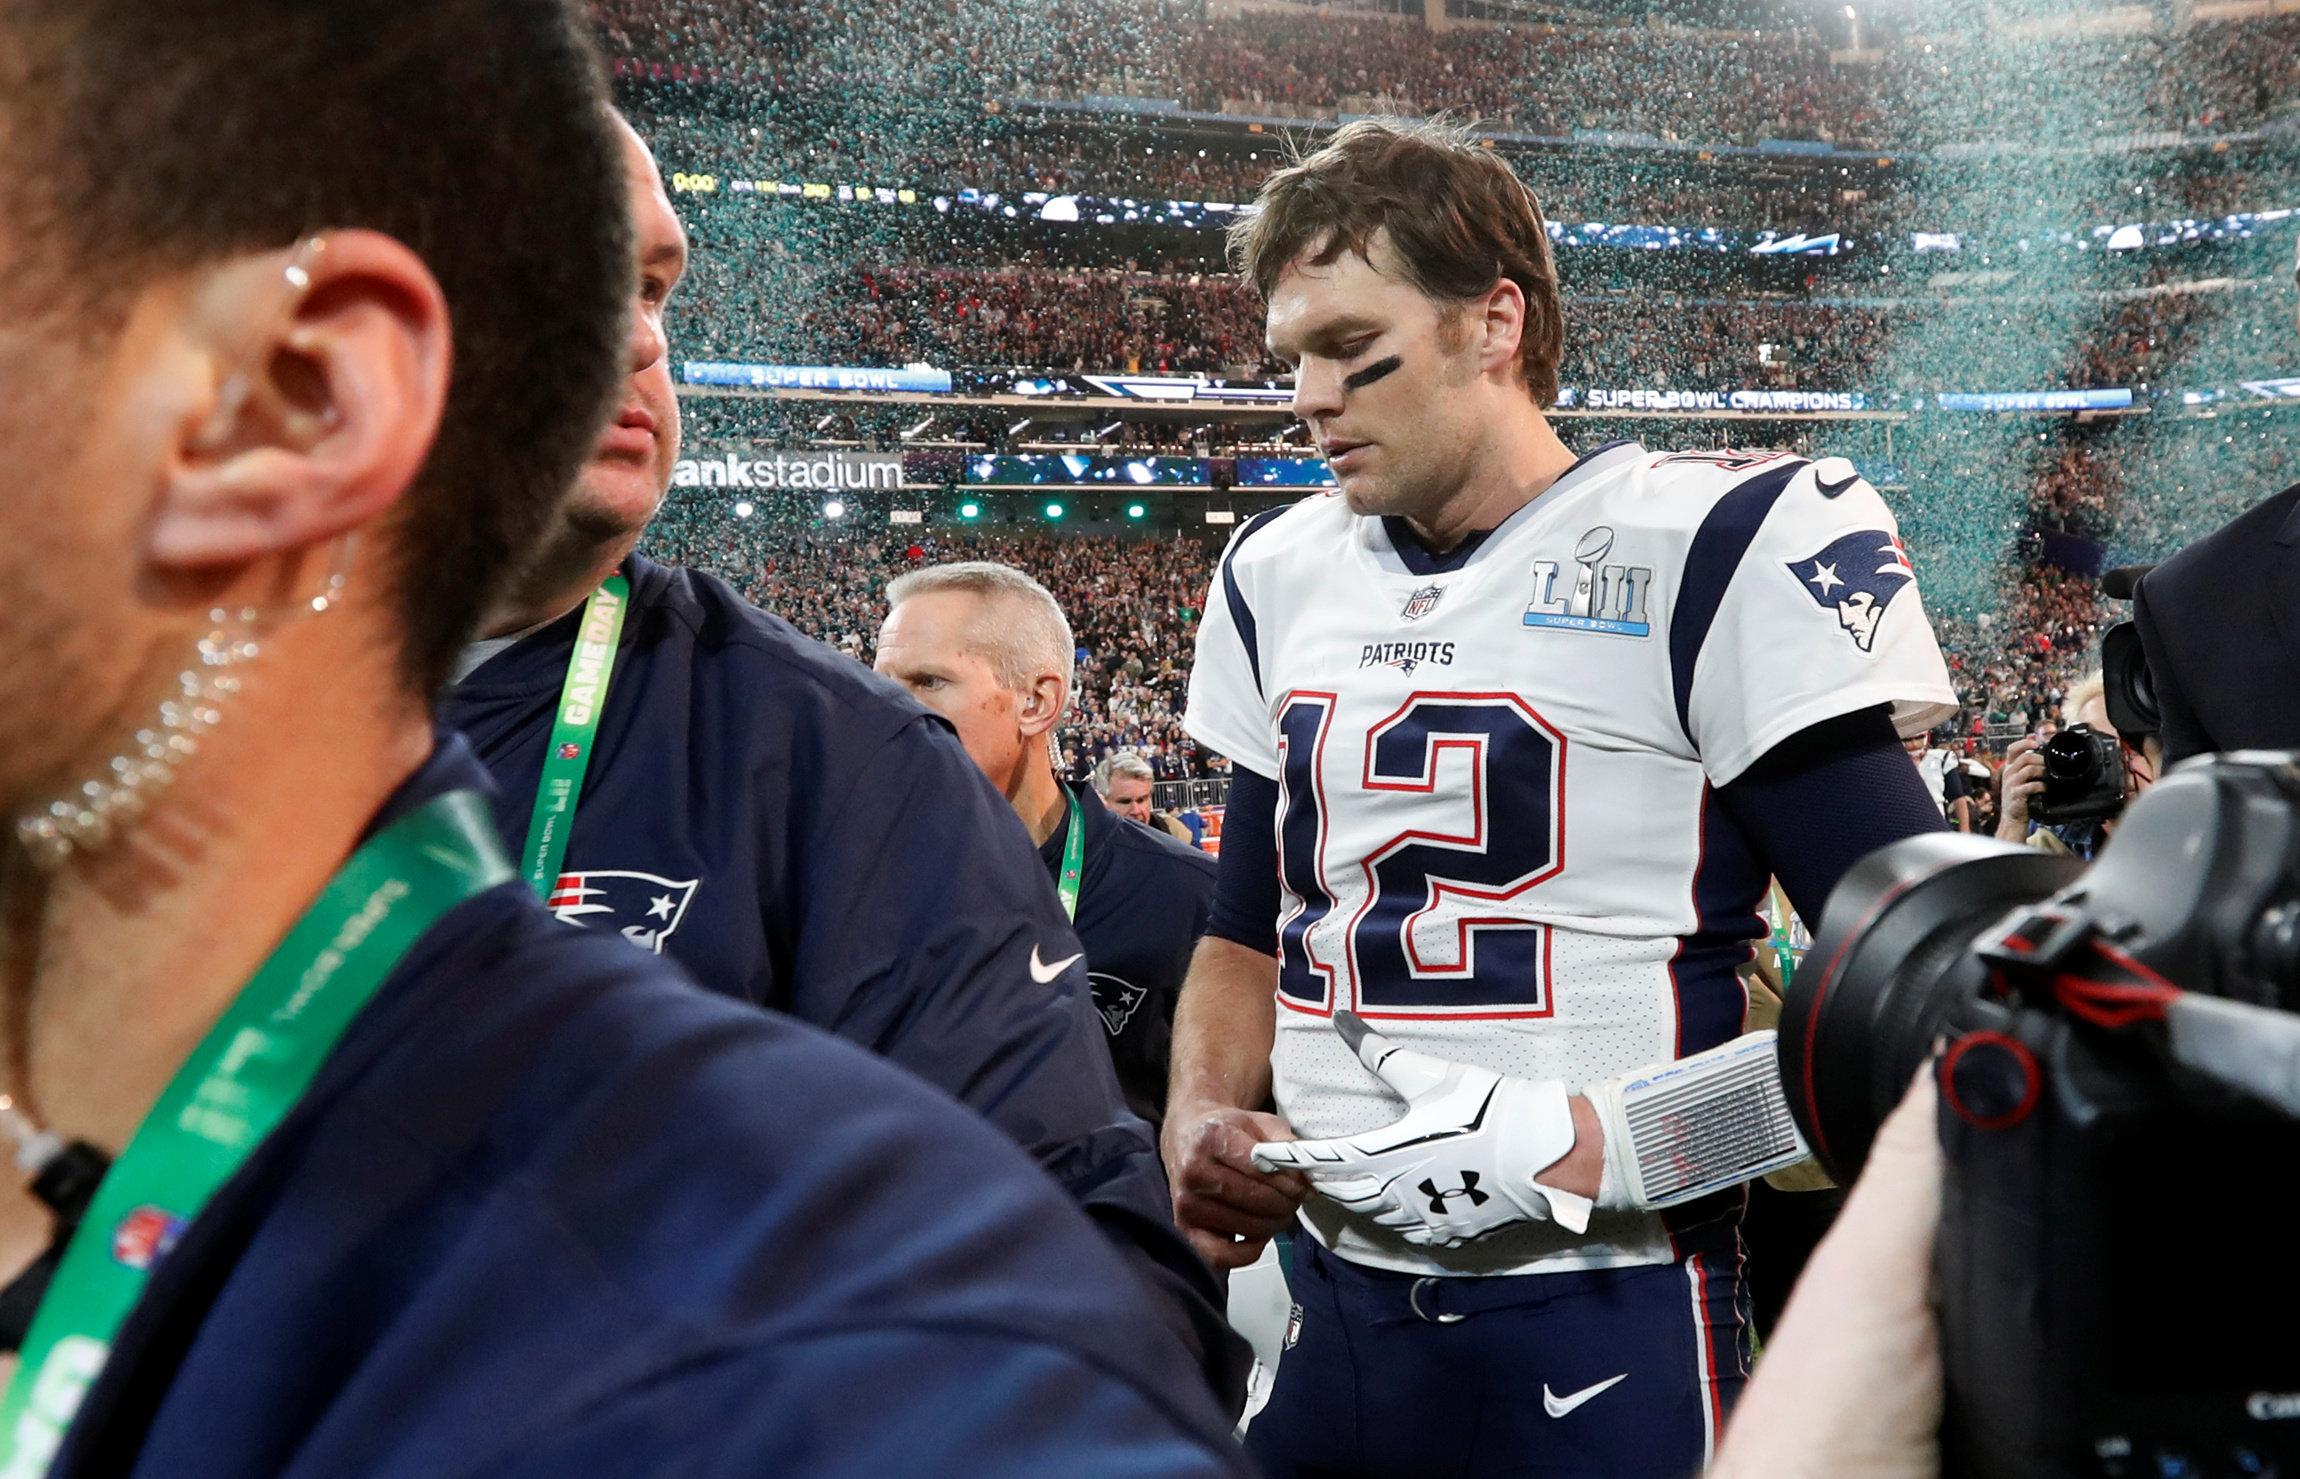 NFL Football - Philadelphia Eagles v New England Patriots - Super Bowl LII - U.S. Bank Stadium, Minneapolis, Minnesota, U.S. - February 4, 2018  New England Patriots' Tom Brady walks off dejected after the game  REUTERS/Kevin Lamarque